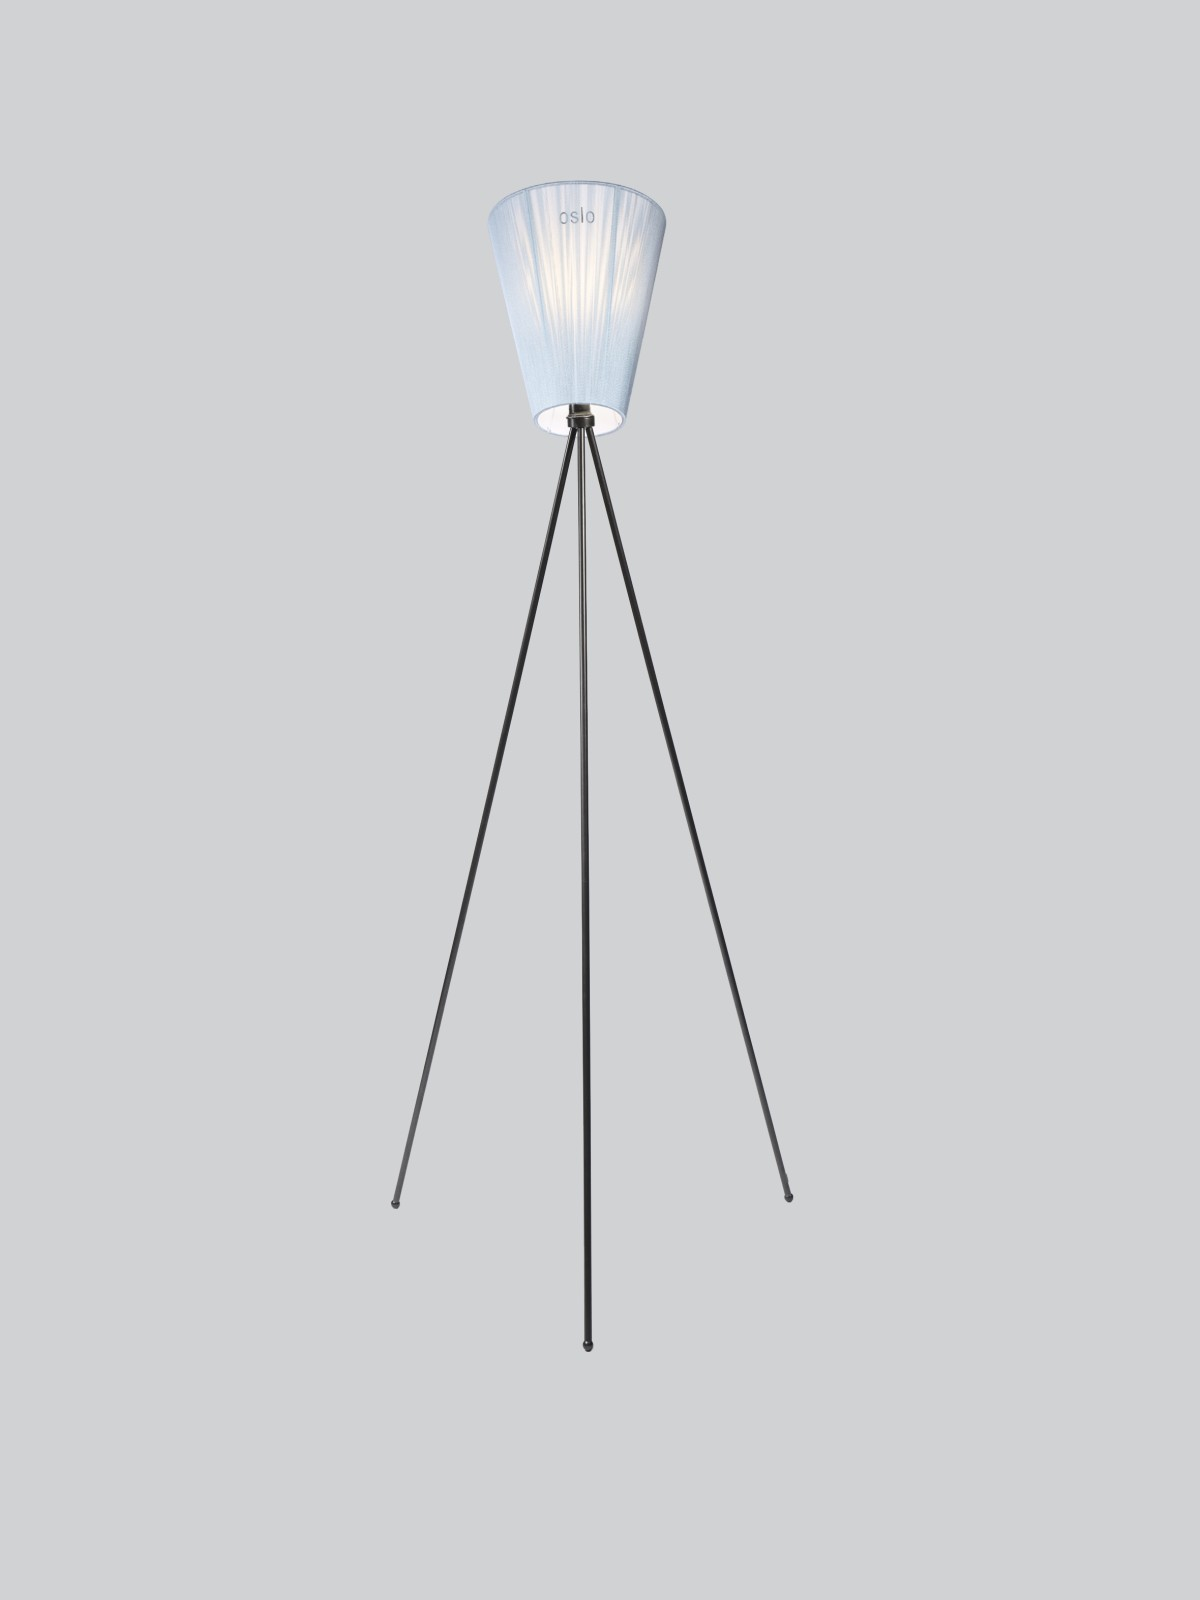 Oslo Wood Floor Lamp Light Blue Shade, Glossy Black Body